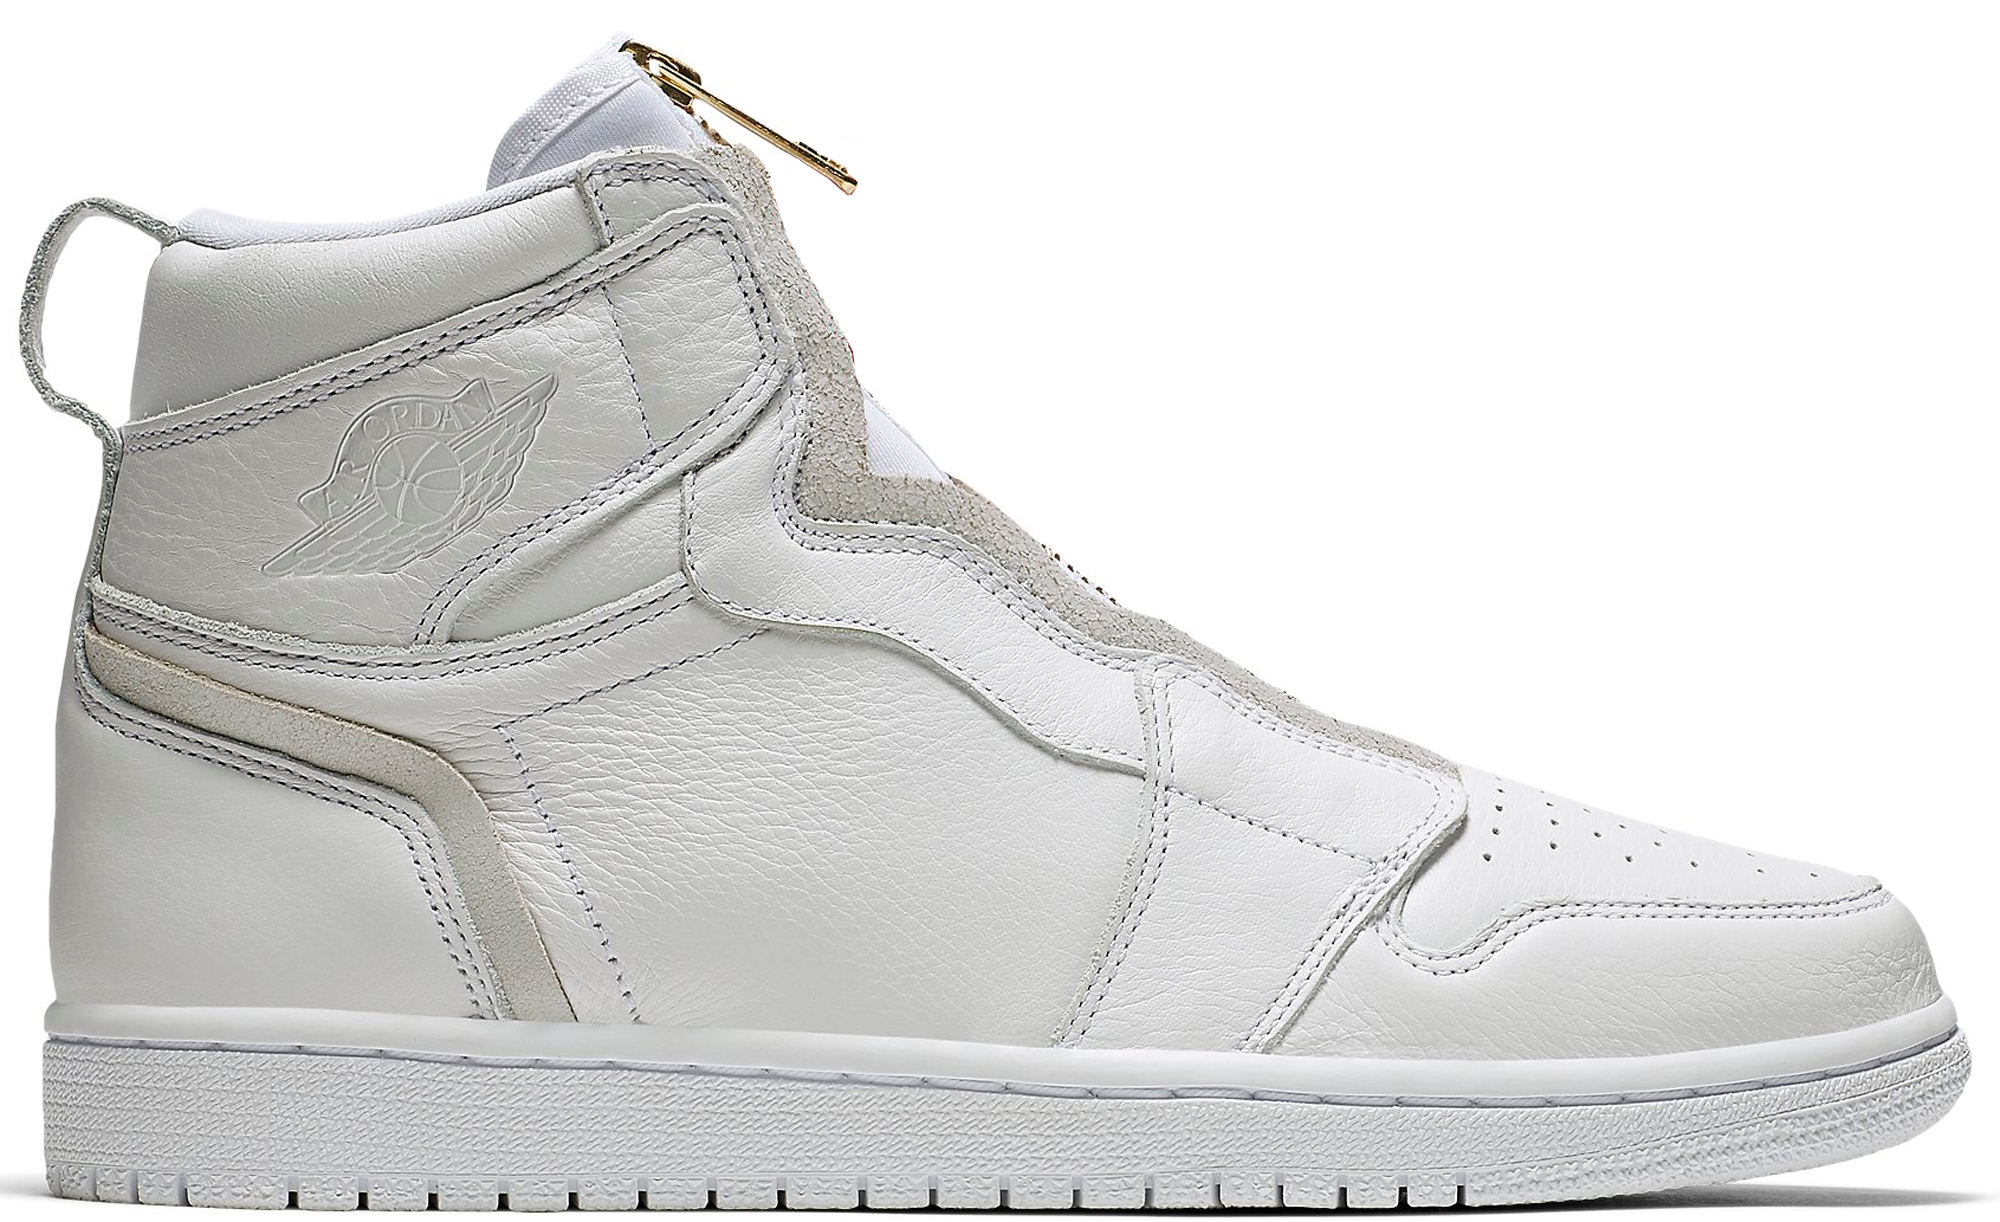 Jordan 1 Retro High Zip White (W)